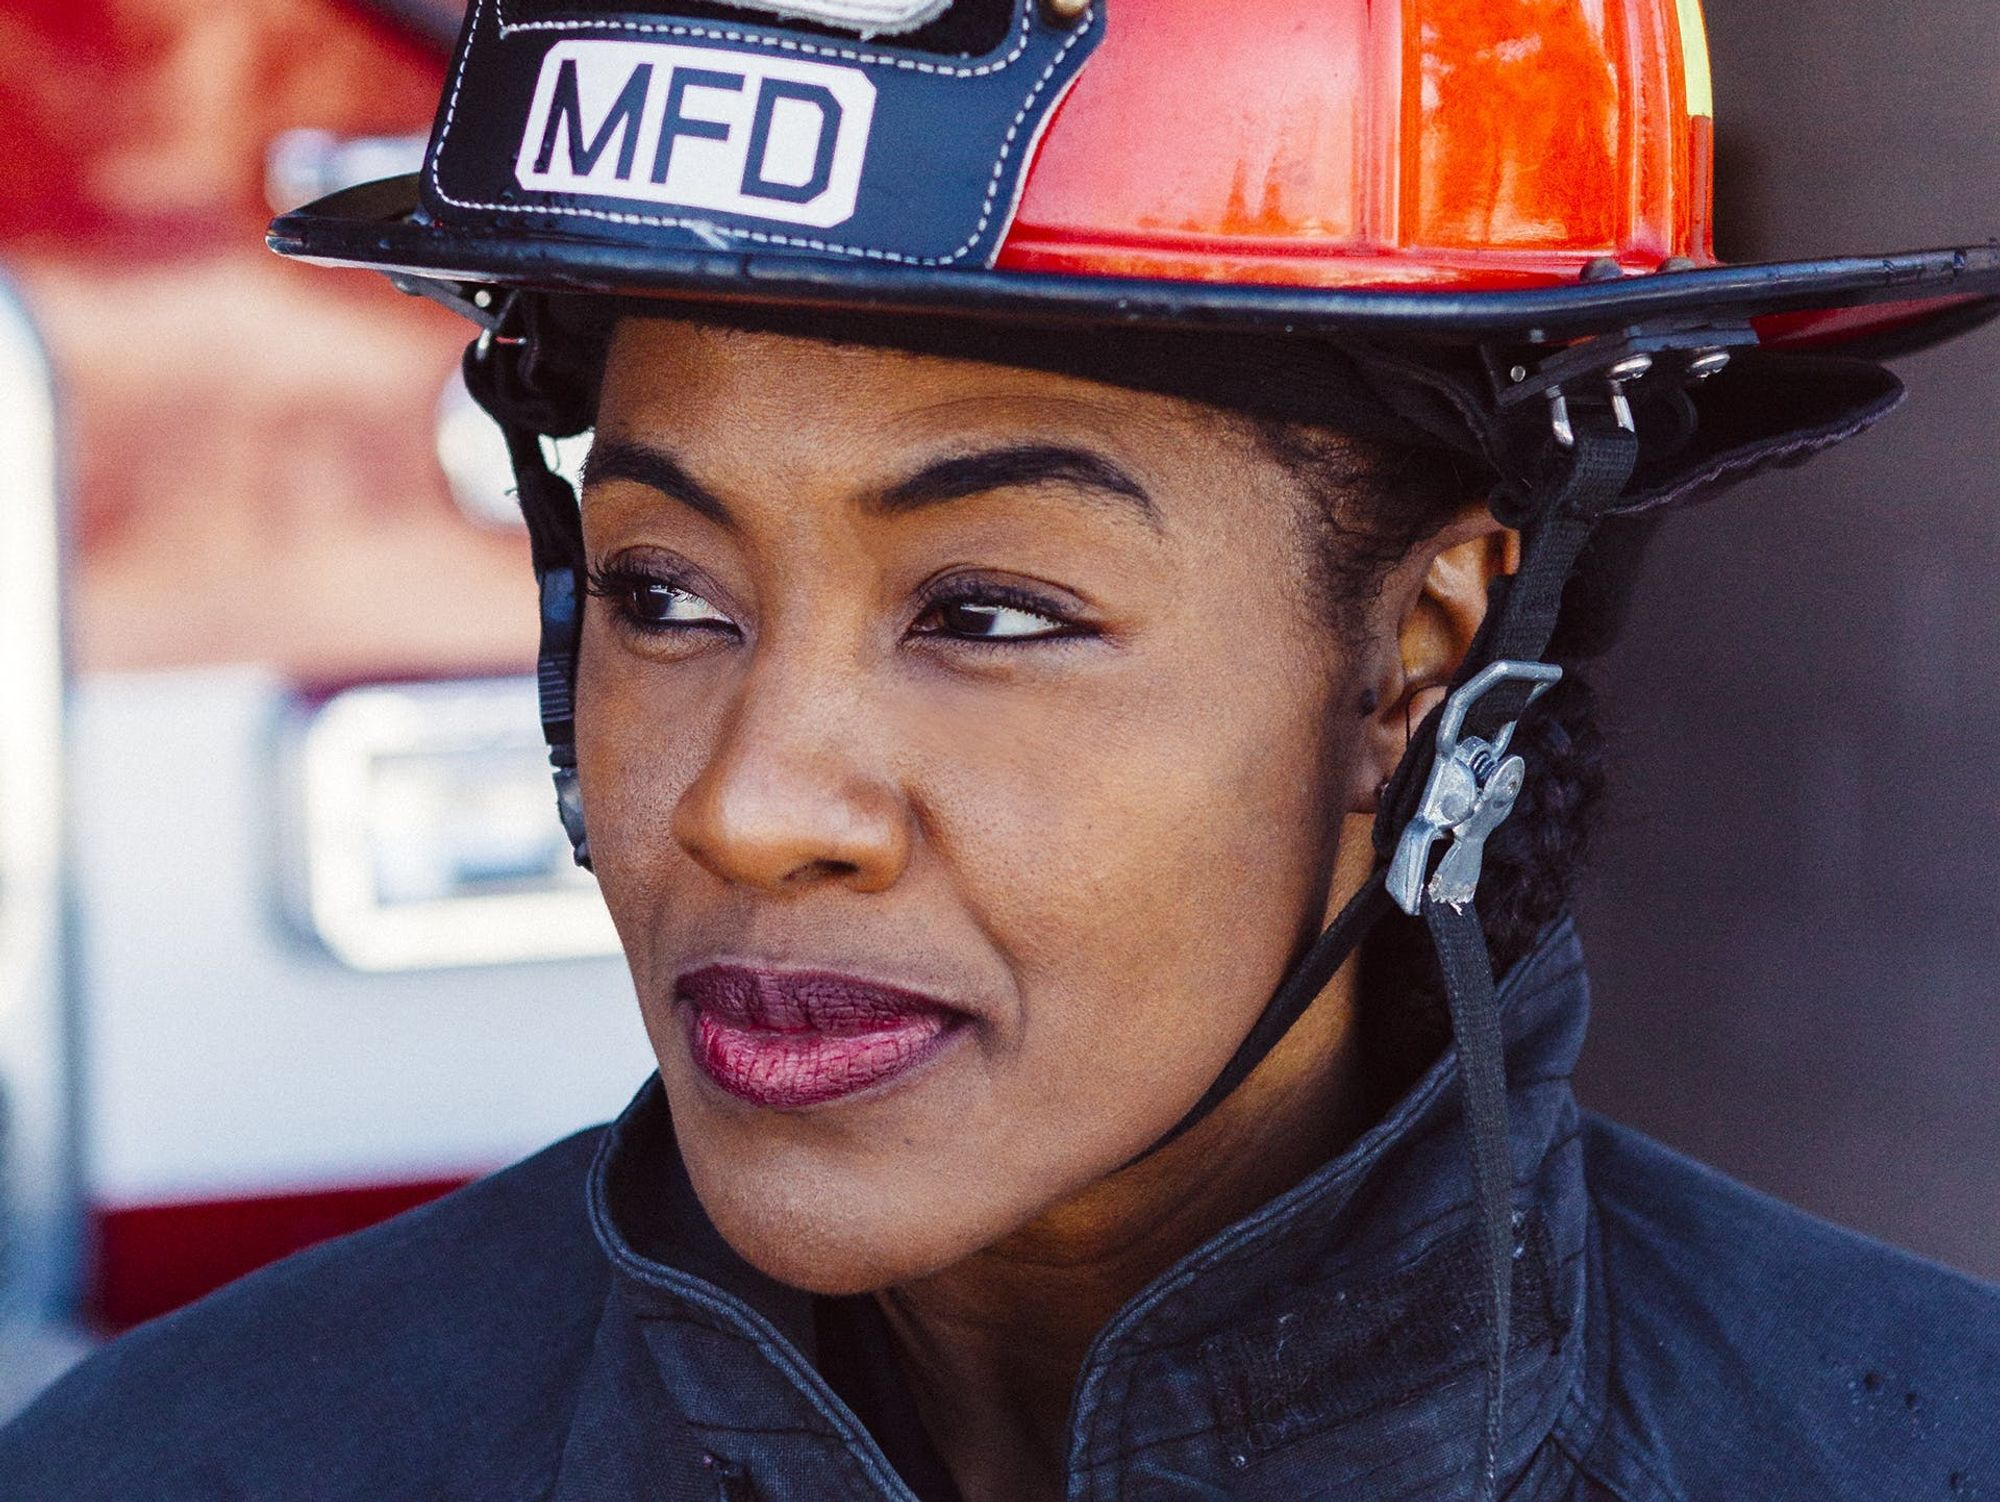 A Woman's Place: Women in Firefighting